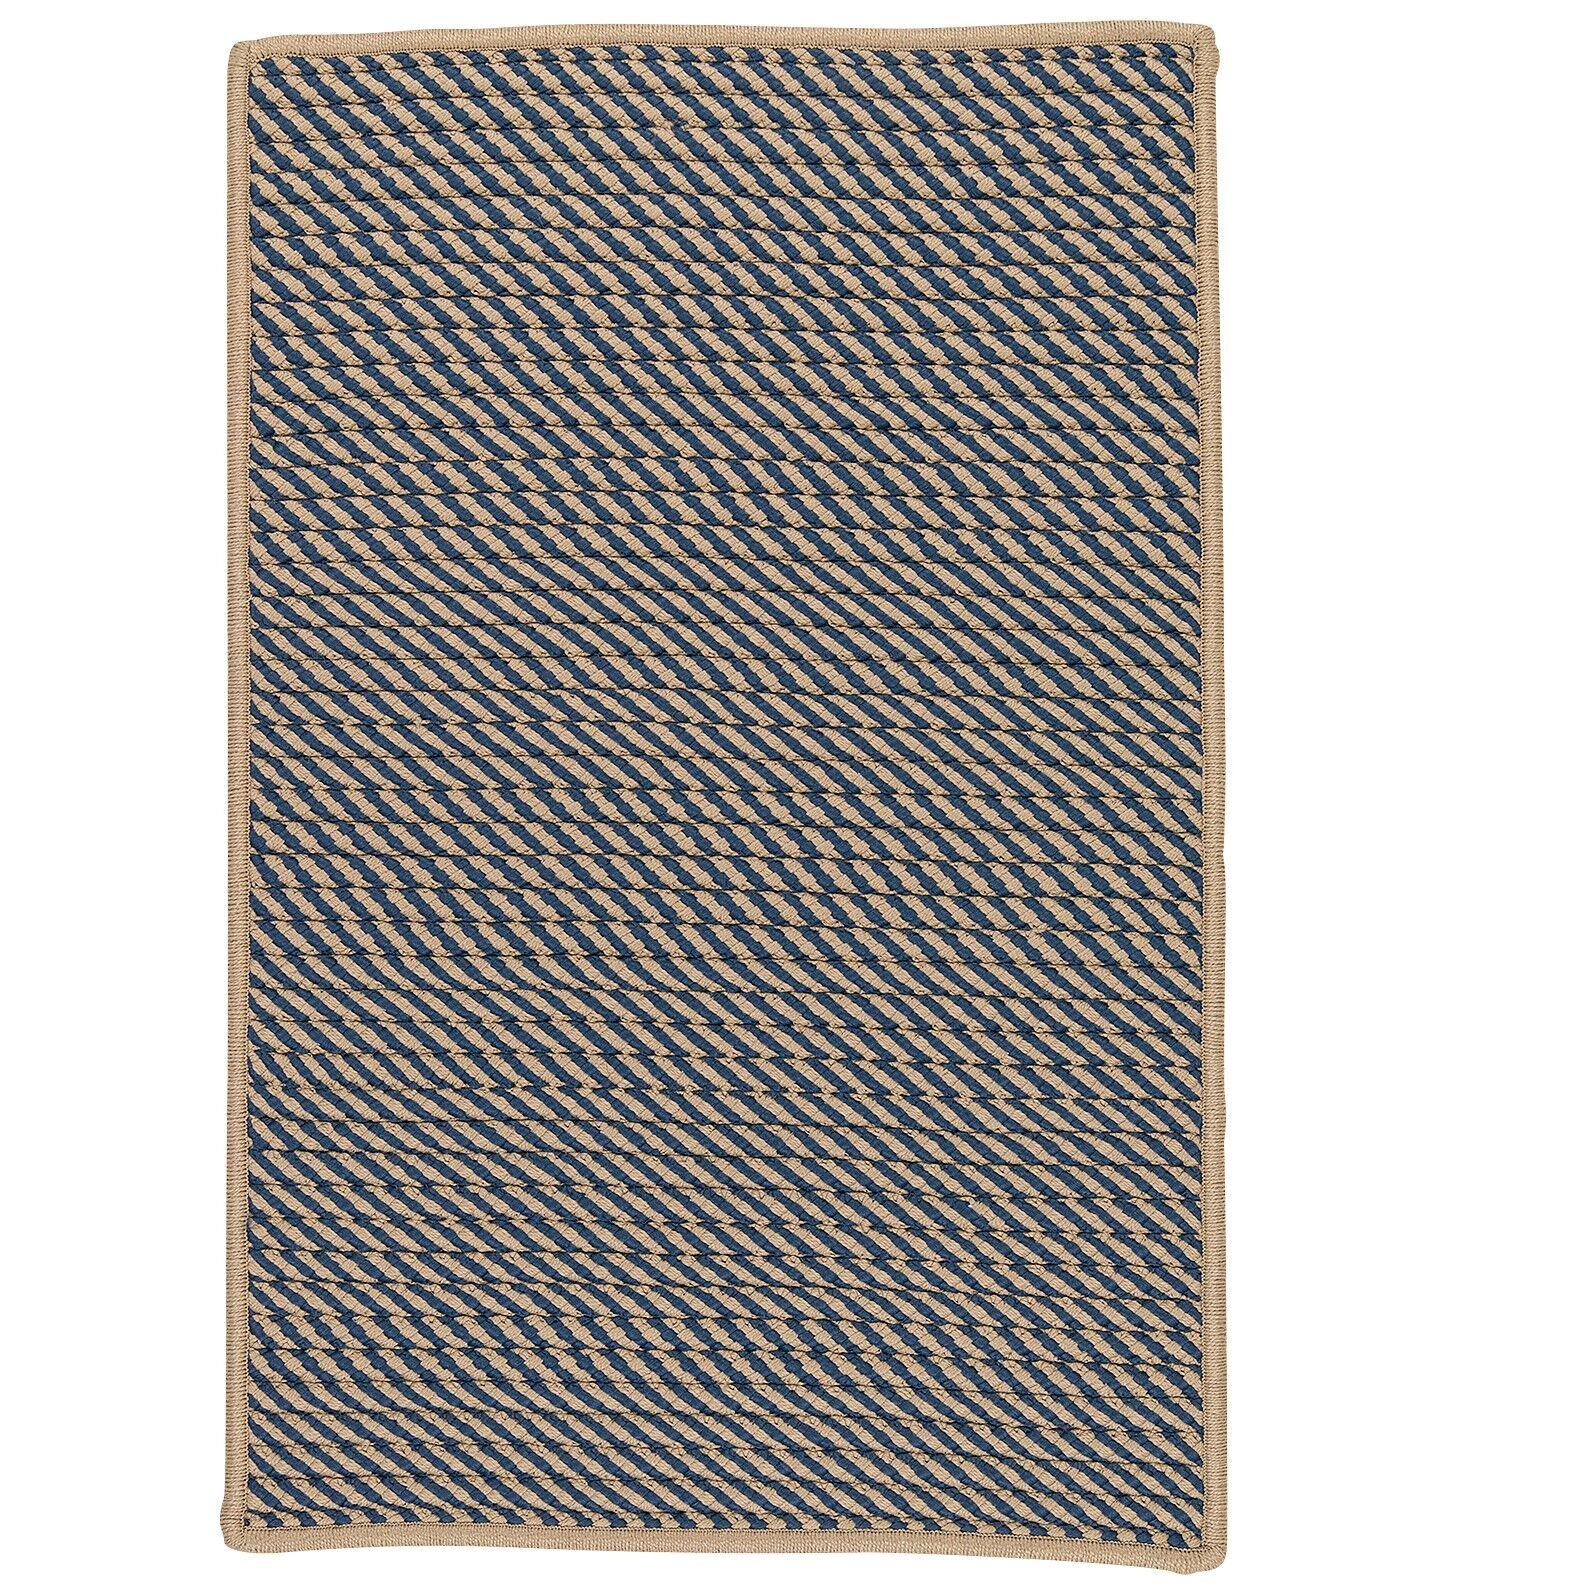 Mammari Striped Hand-Woven Blue Indoor/Outdoor Area Rug Rug Size: Rectangle 3' x 5'